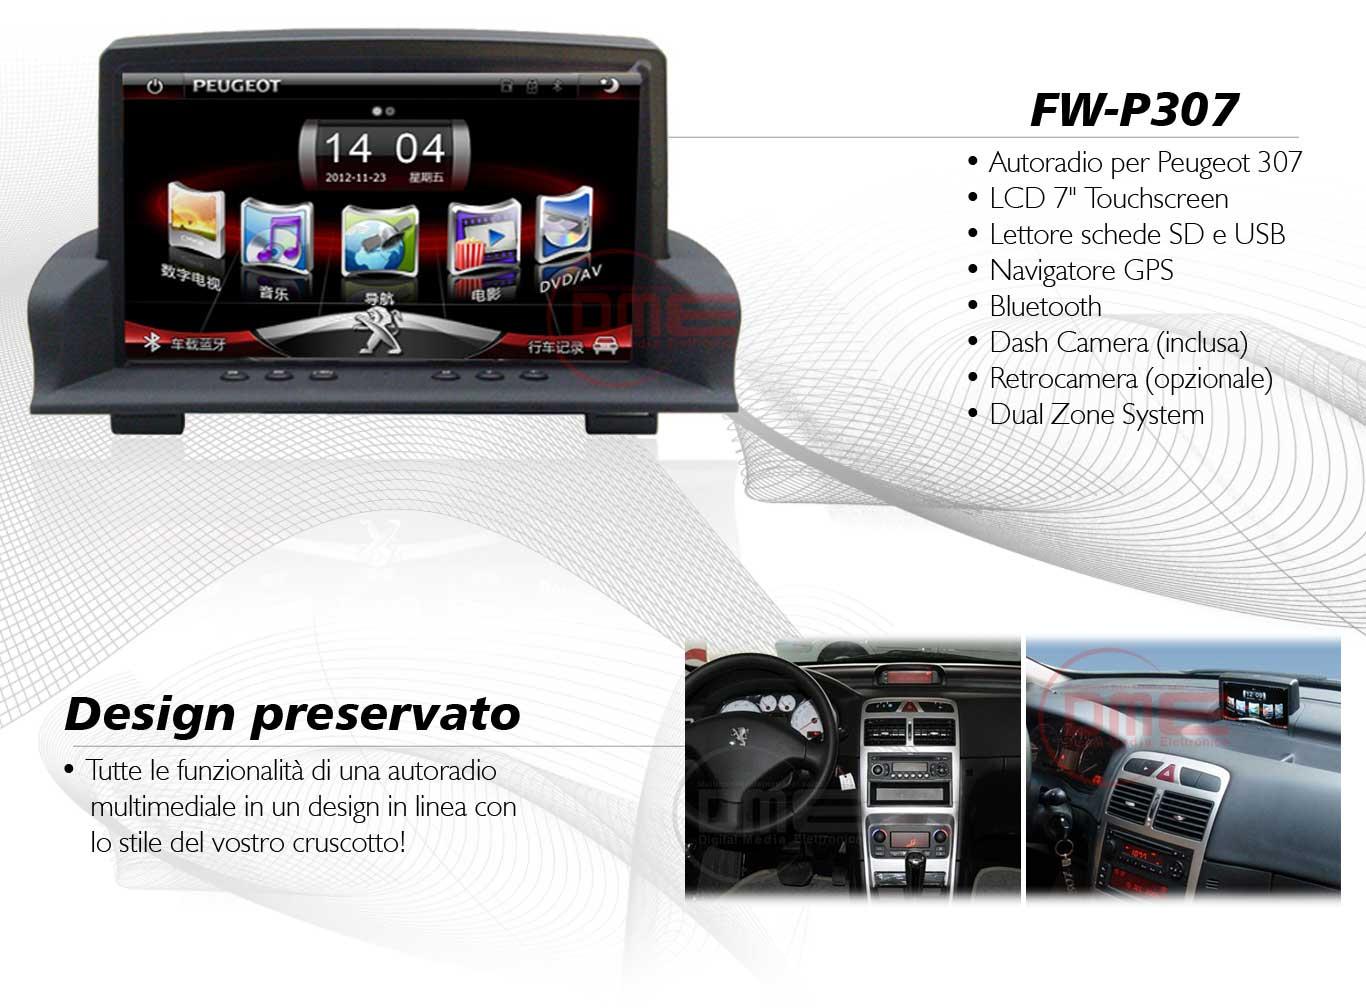 autoradio multimediale per Peugeot 307 (fino al 2008)